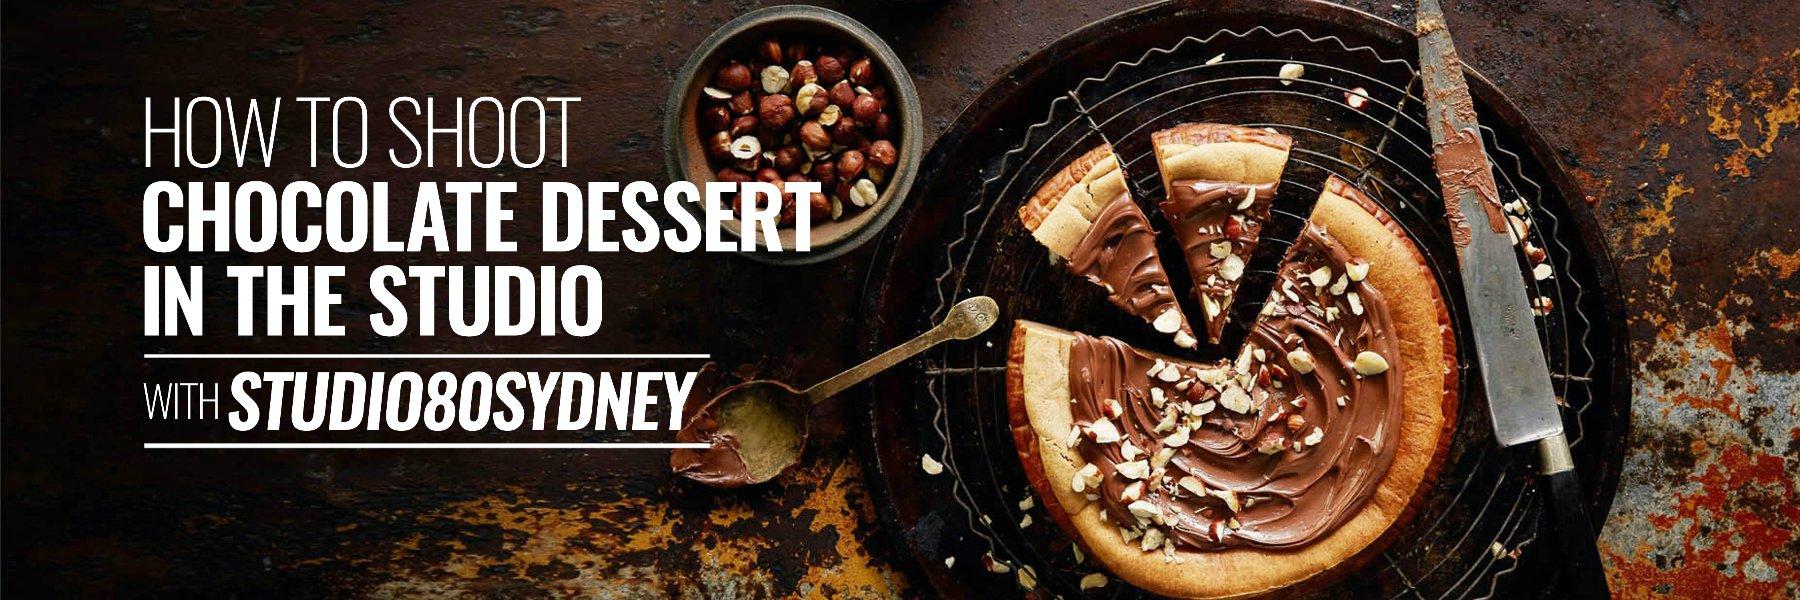 CHOCOLATE DESSERT PHOTOGRAPHY LESSON